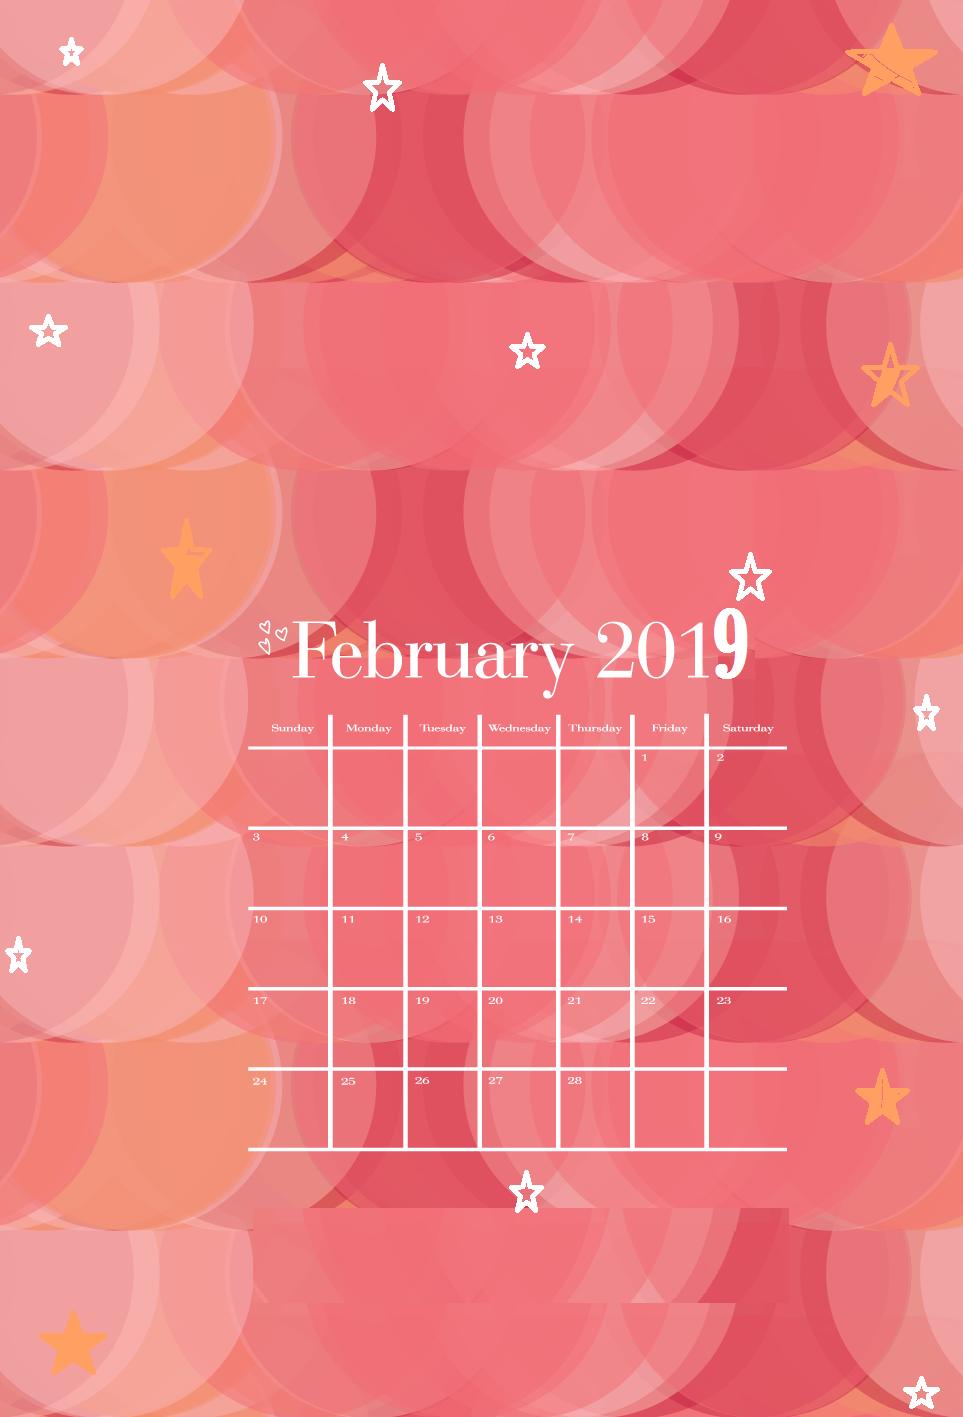 february 2019 iphone calendar wallpapers  february